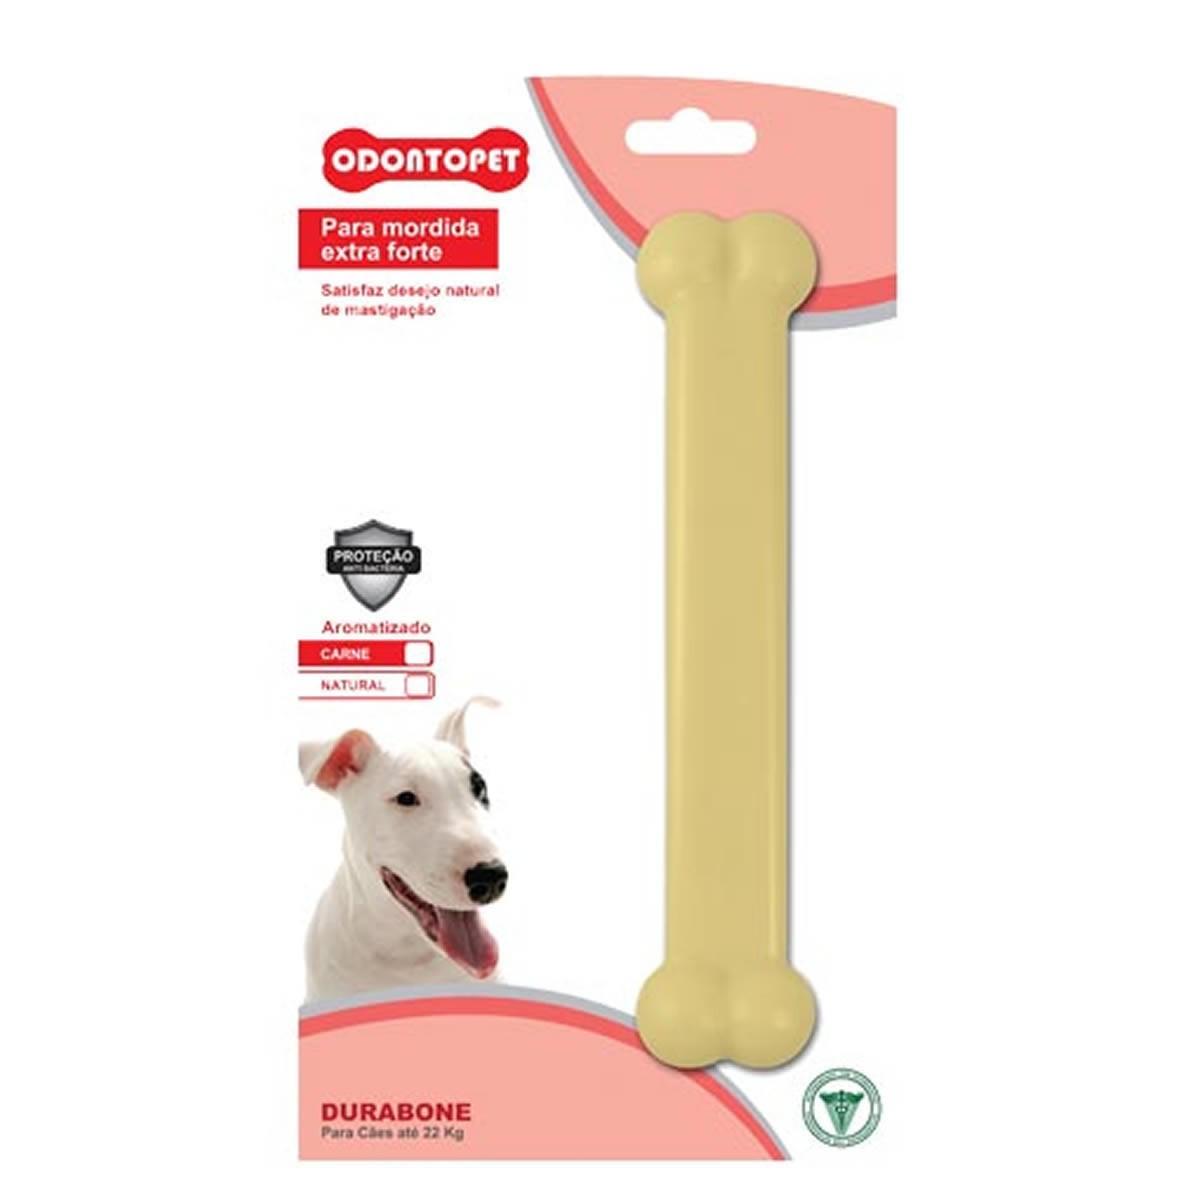 Brinquedo para Cachorro Durabone Odontopet Bege